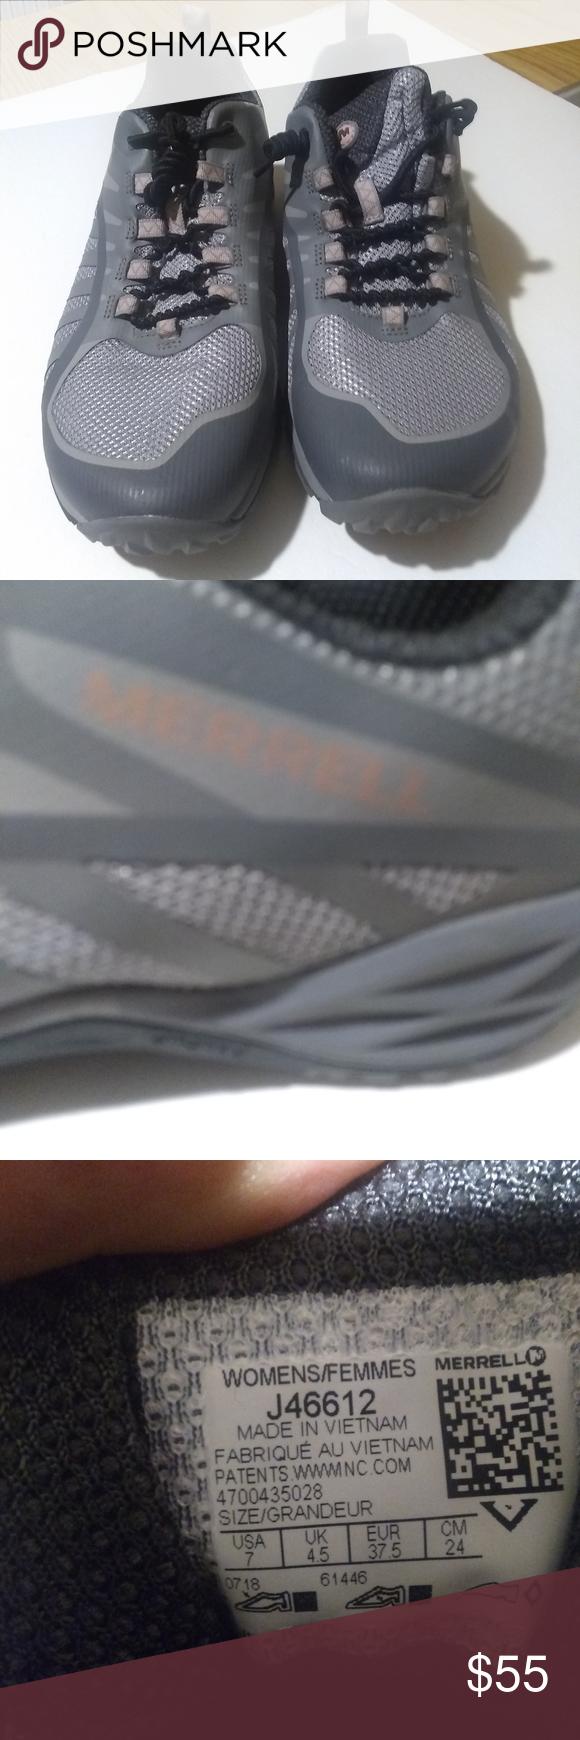 merrills sneakers